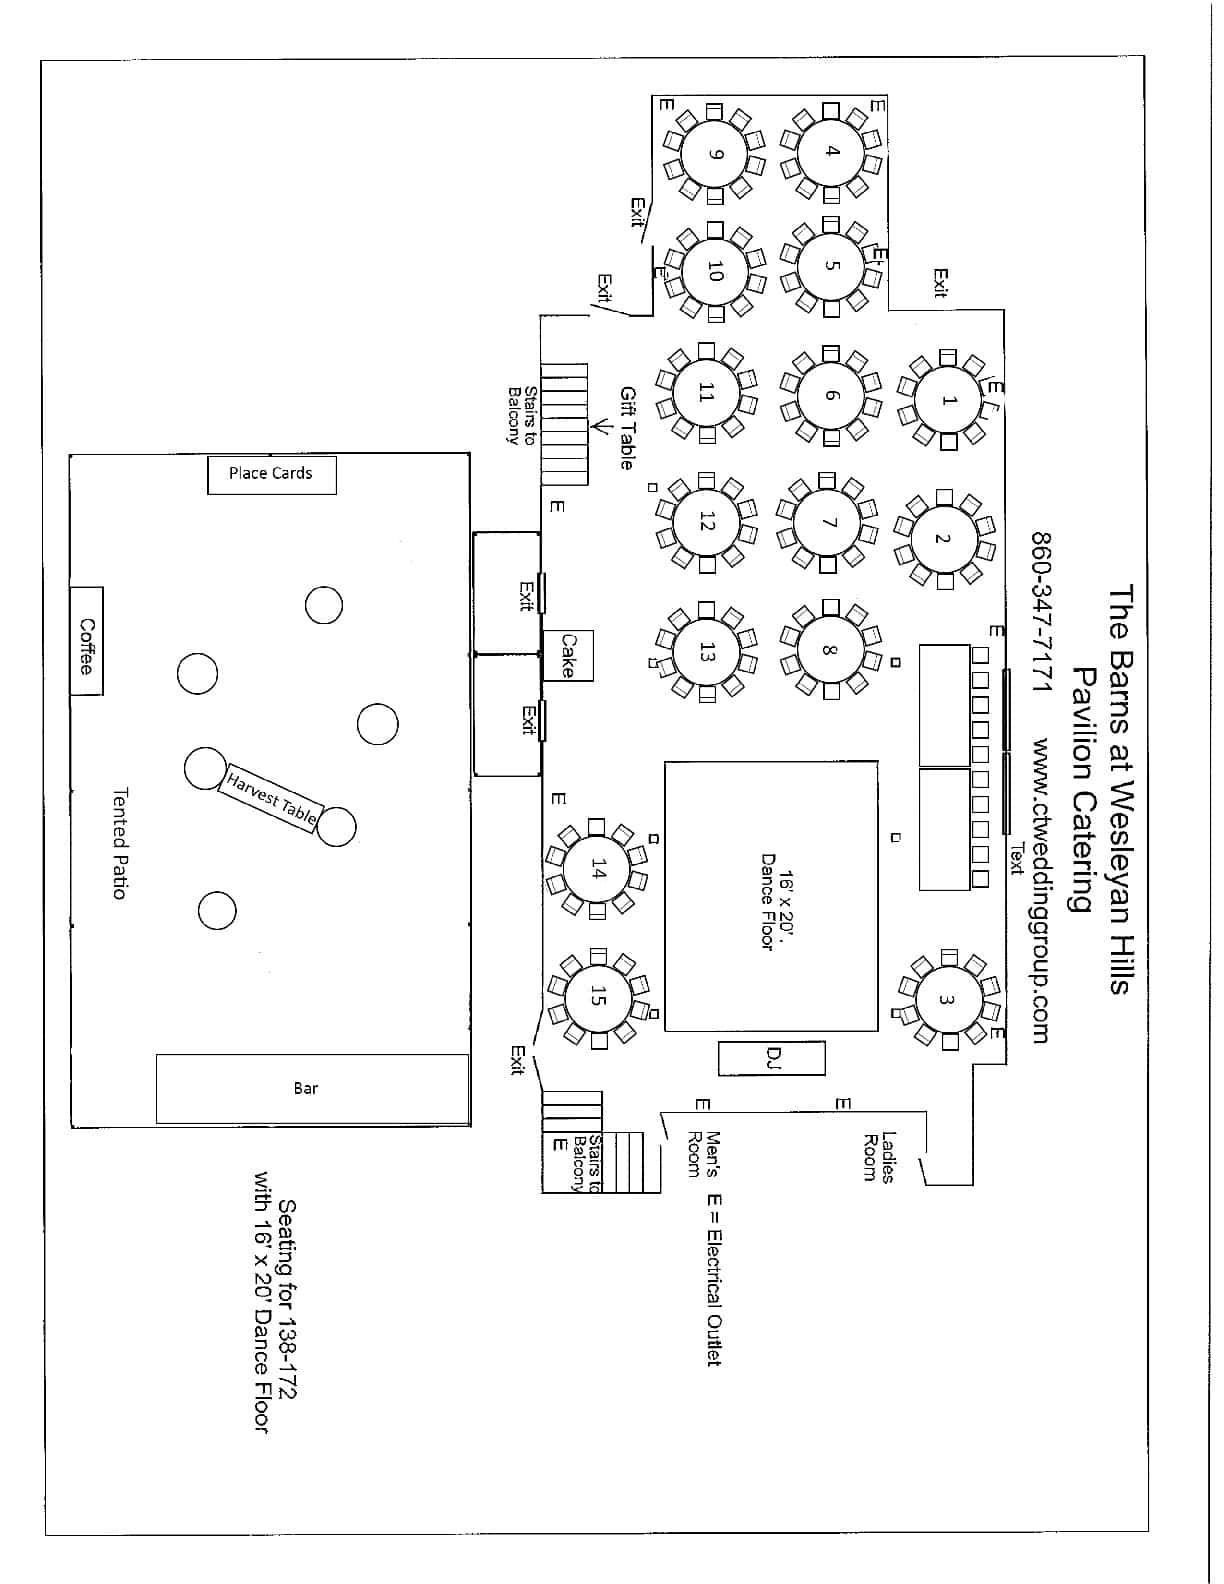 117_13370_Barns-at-Wesleyan-Hills-Floor-Plan-Long-Table_2016-001